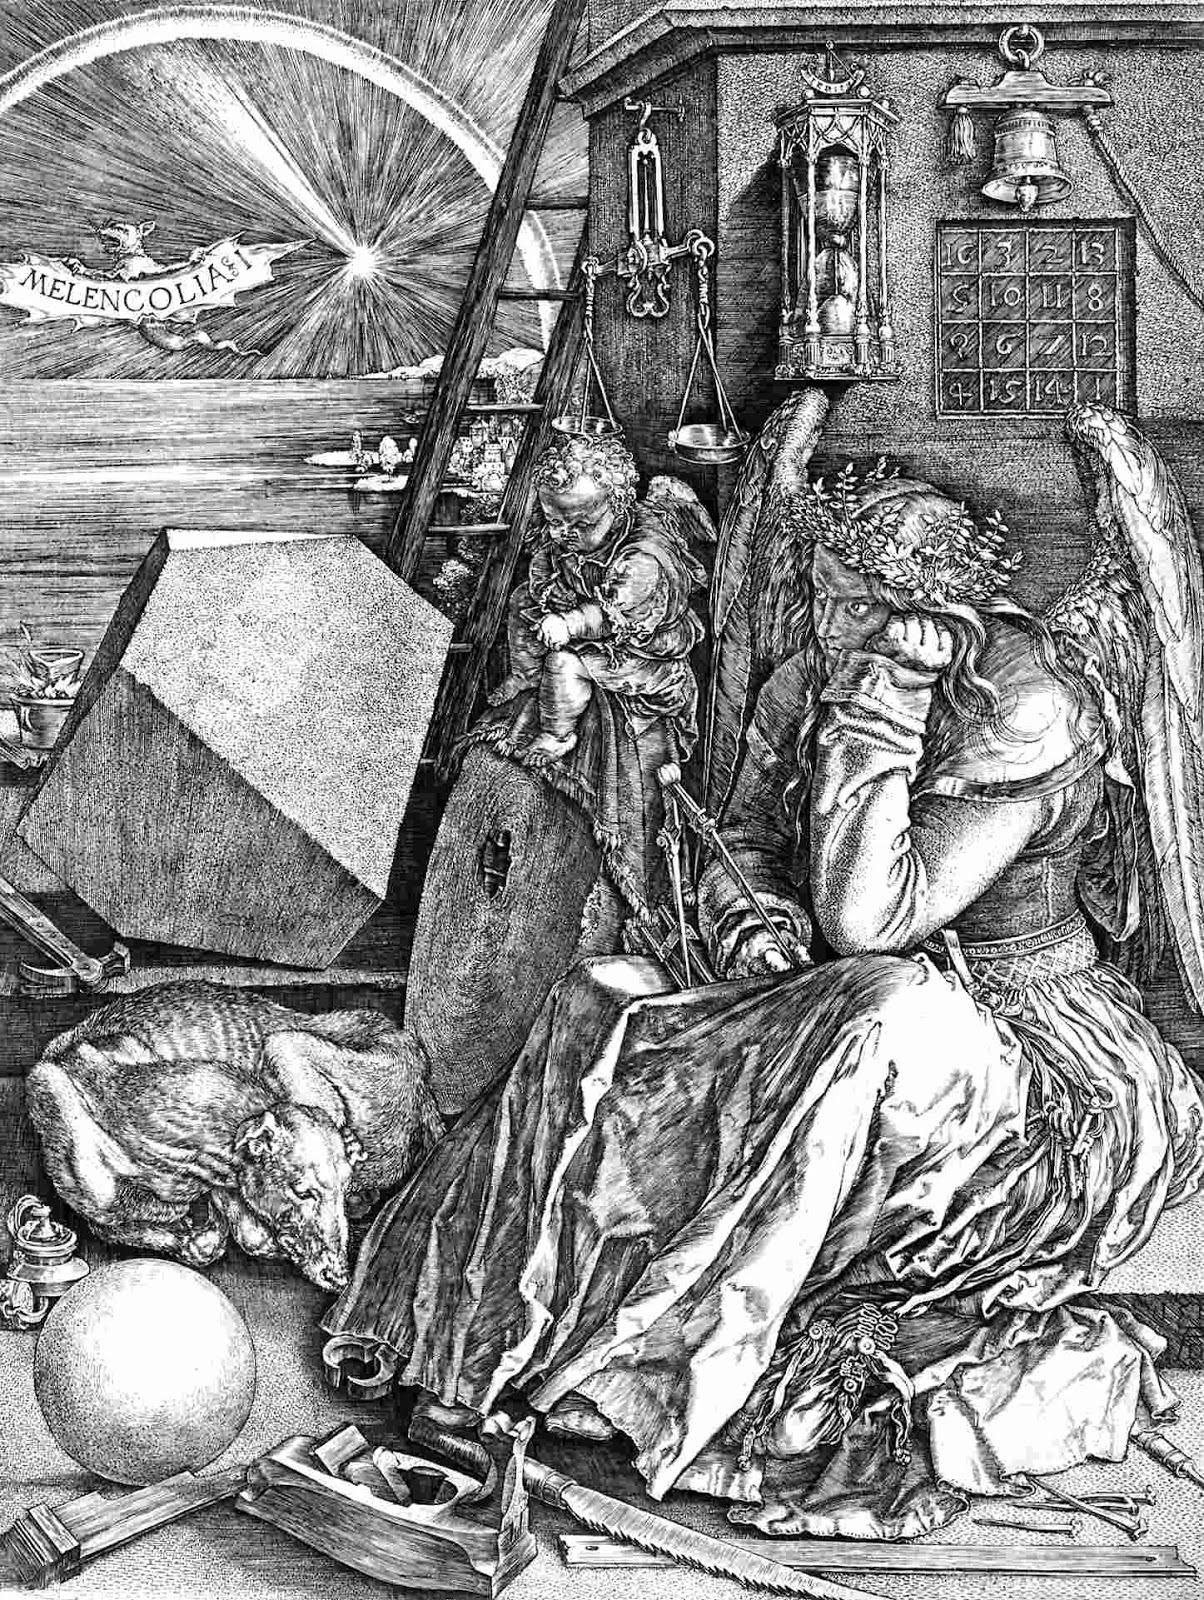 Melancolía I¨ Grabado de Alberto Durero | Albrecht Durer | Pinterest ...